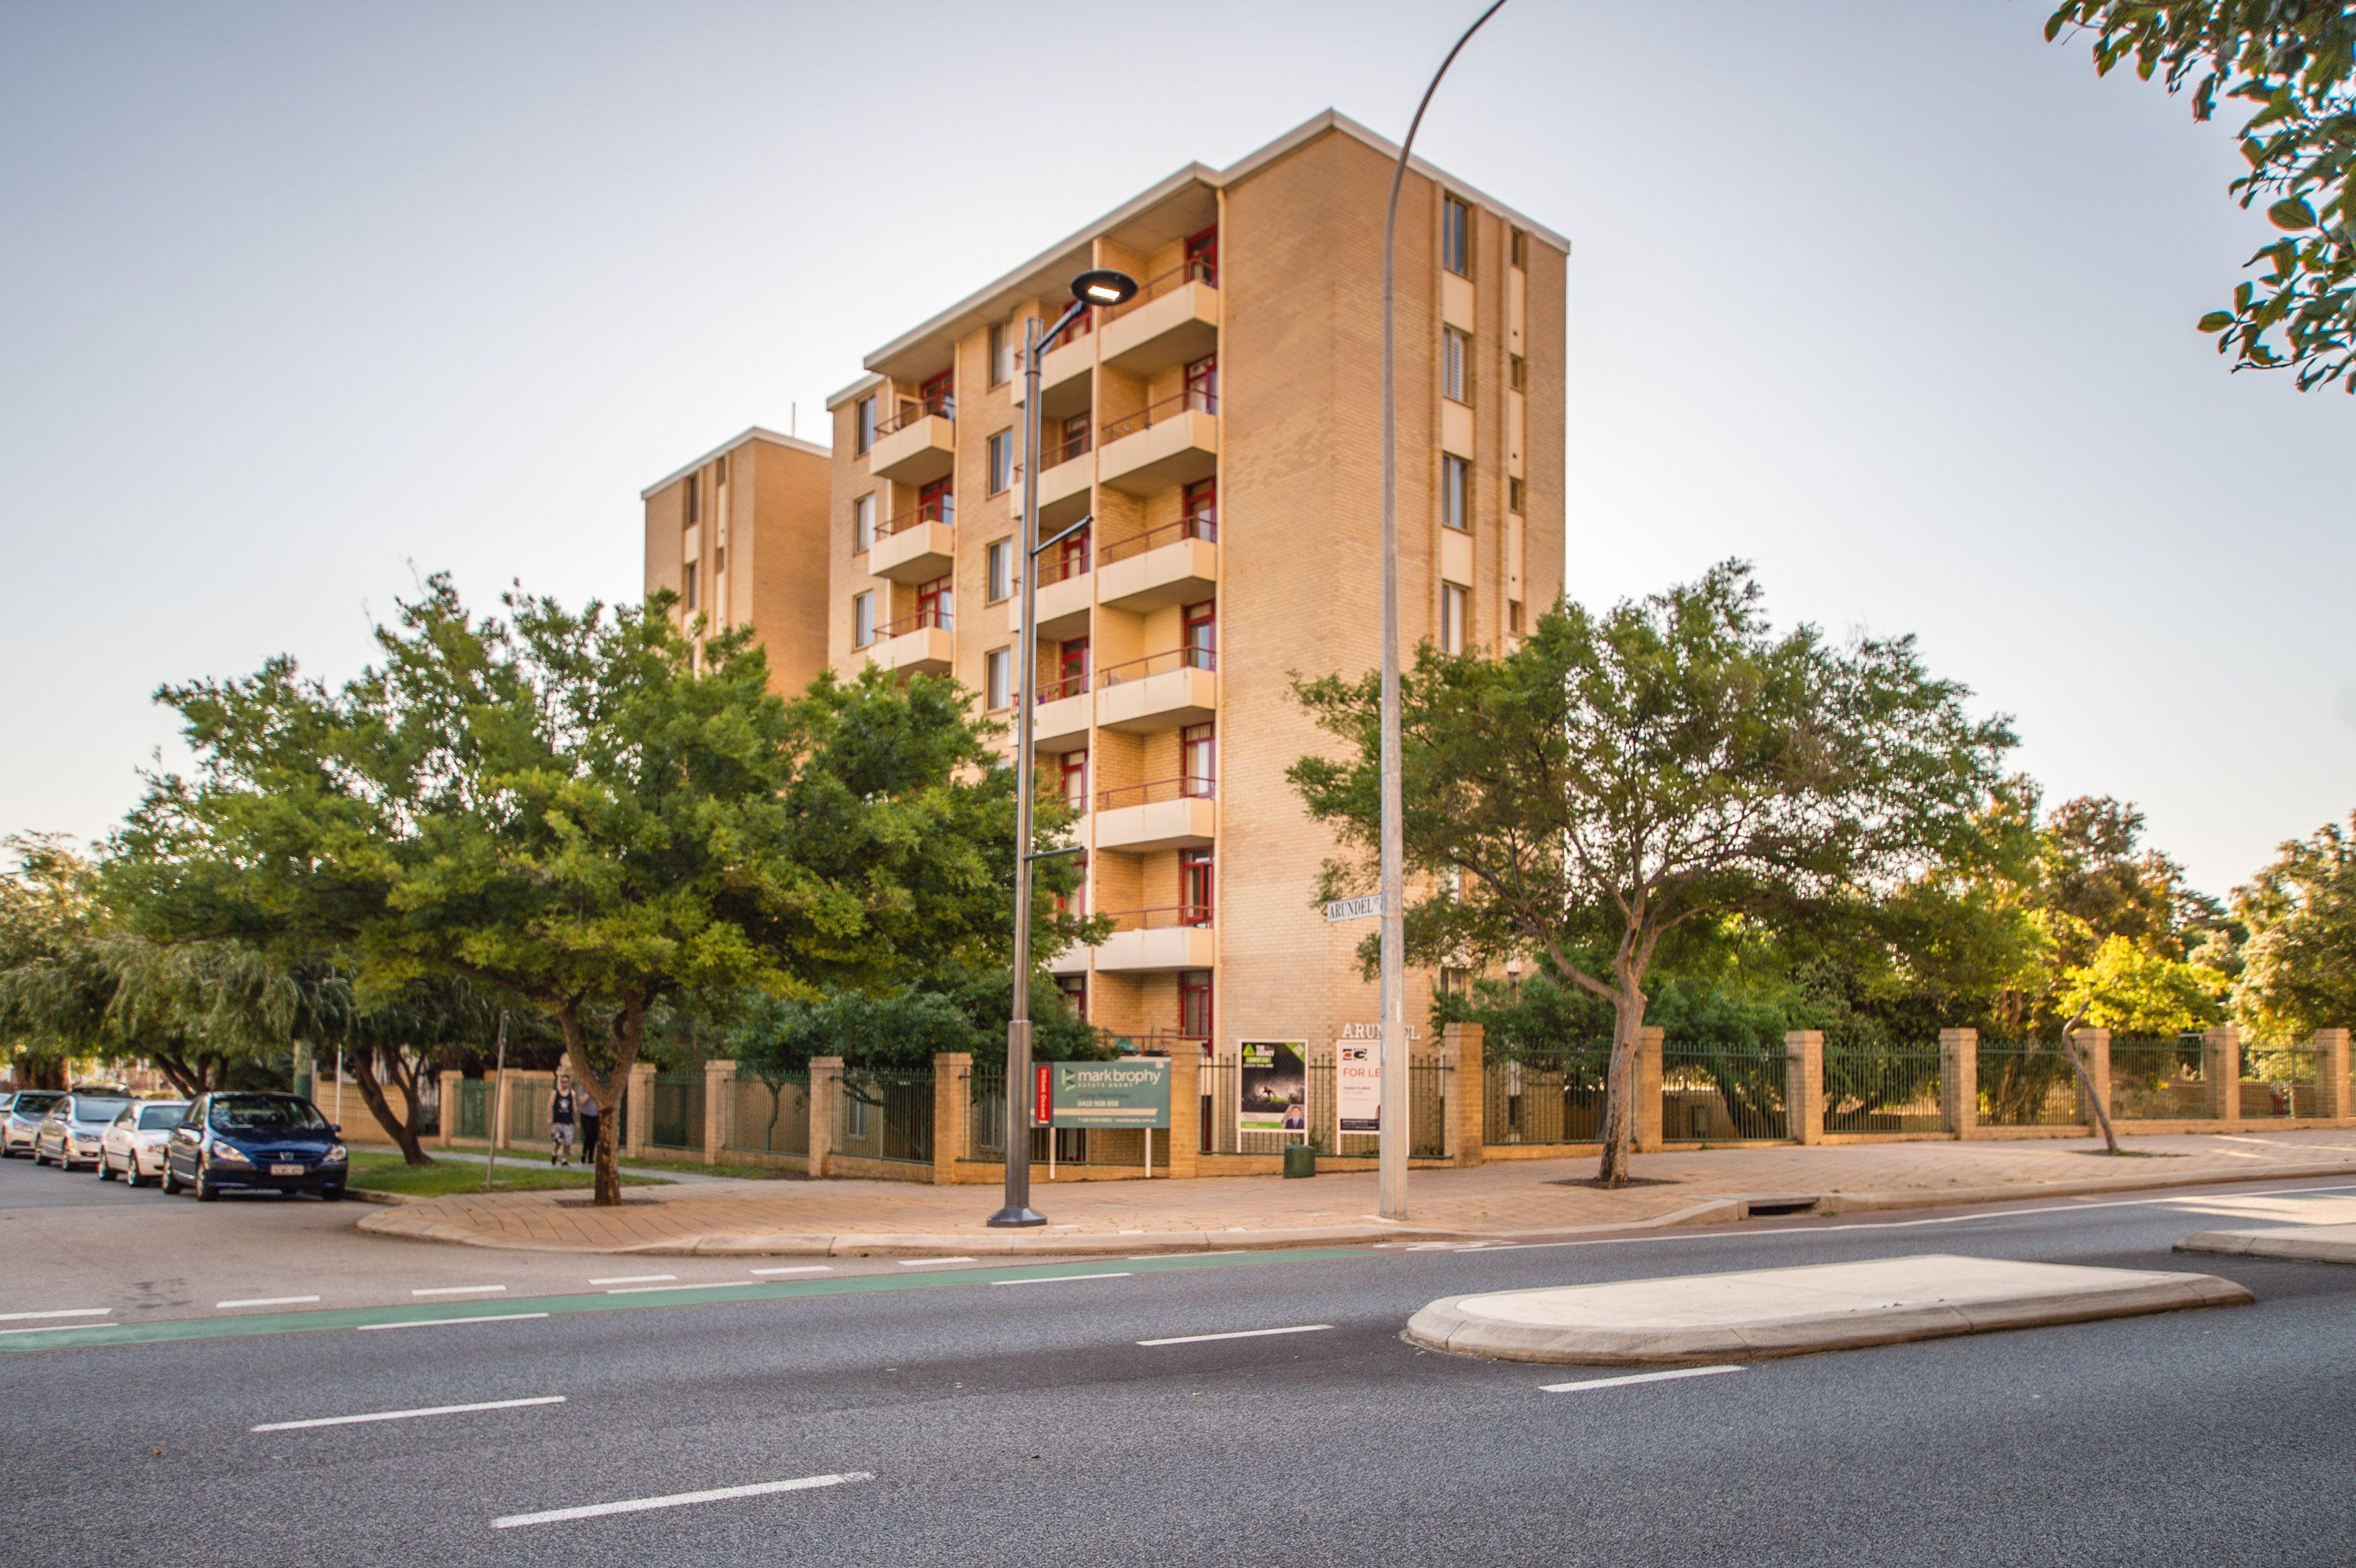 16/34 Arundel Street, Fremantle